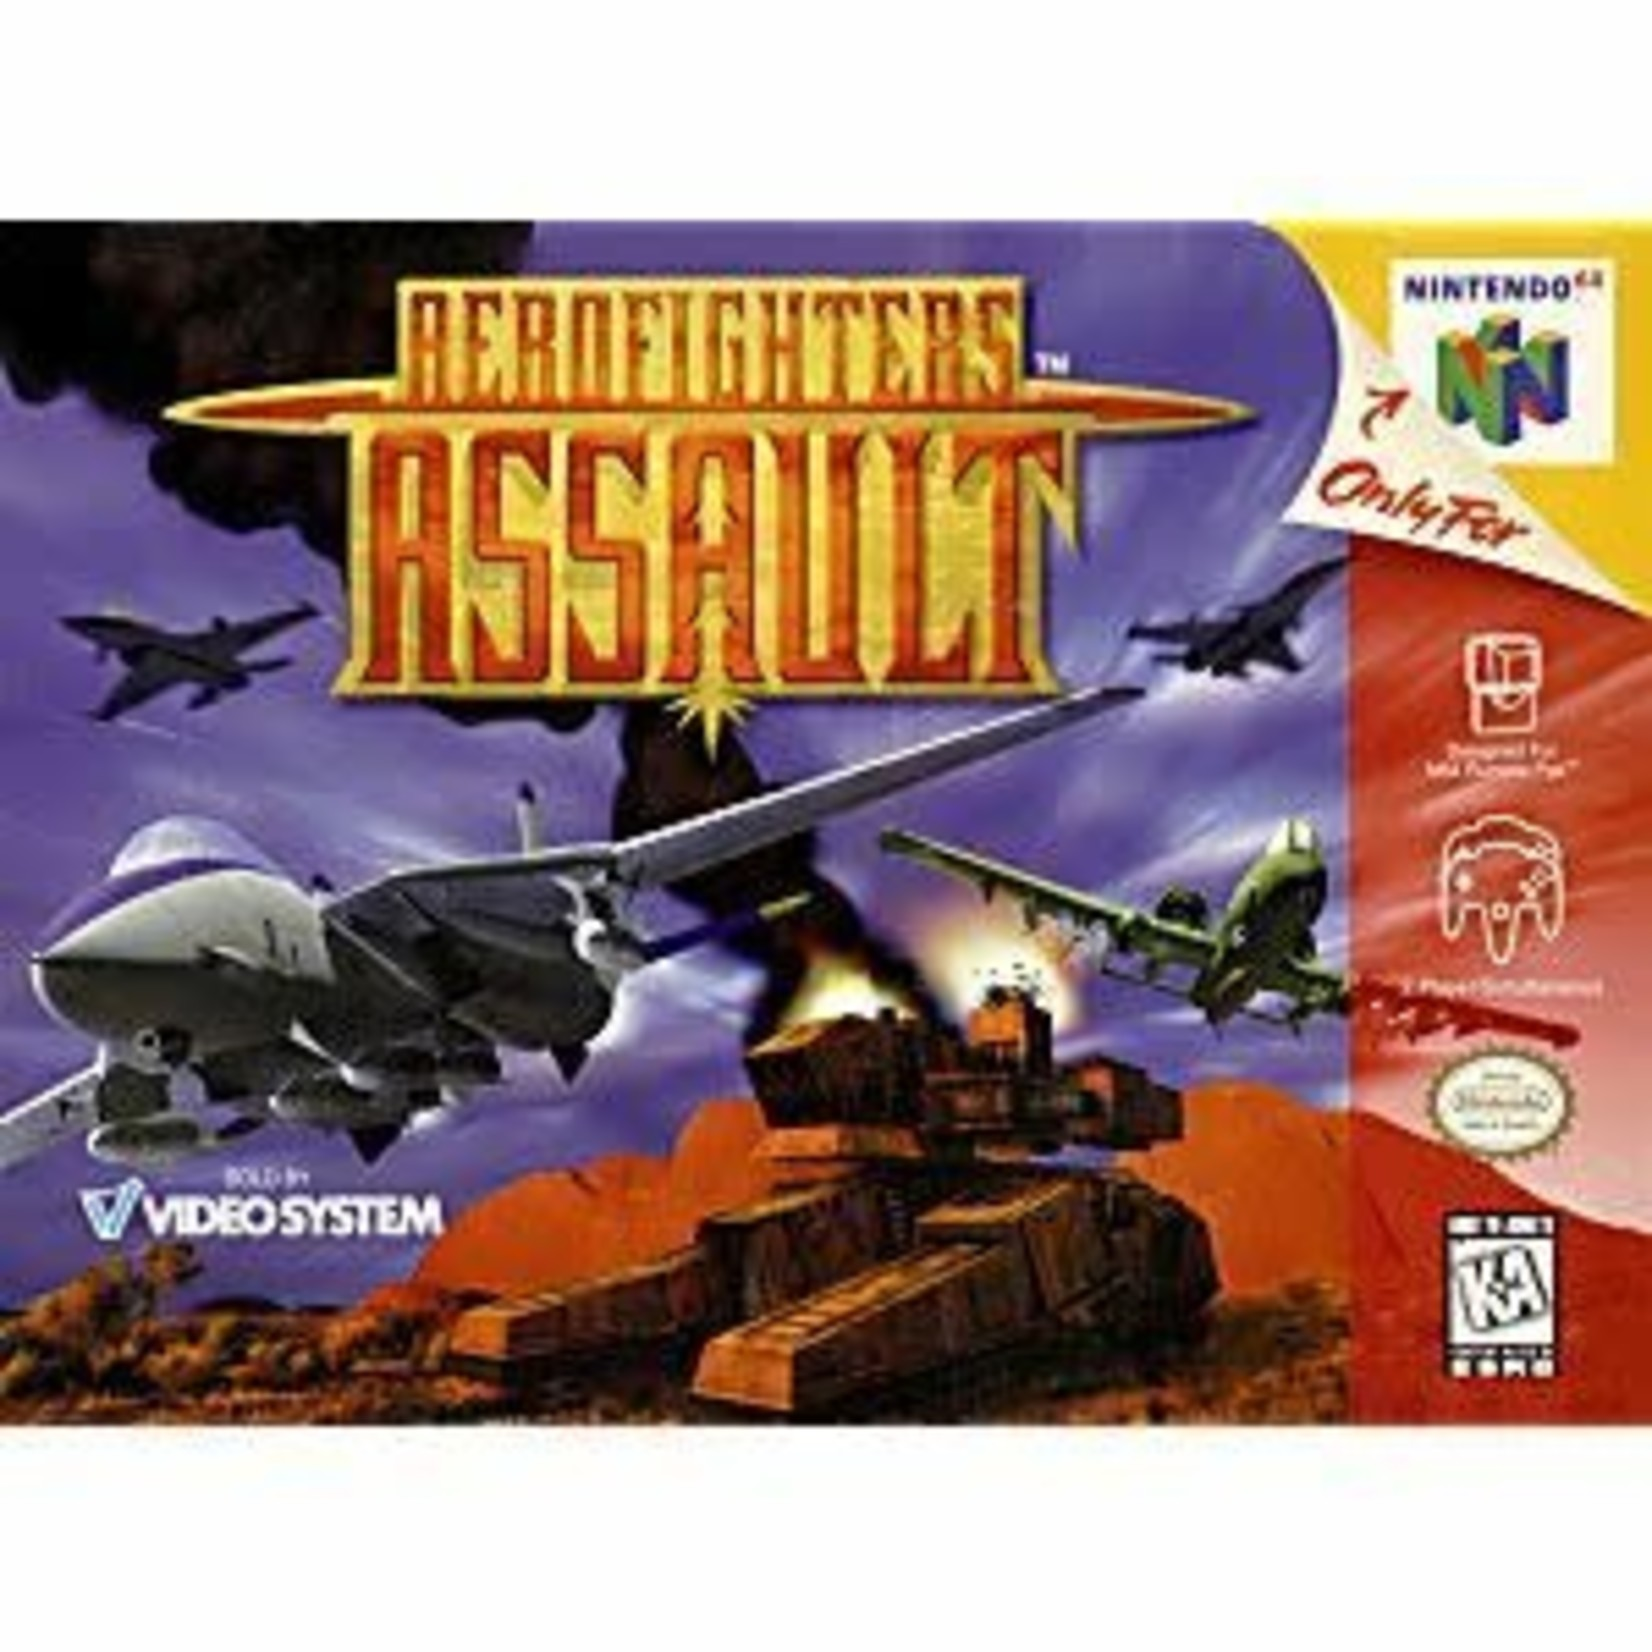 N64U-AEROFIGHTERS ASSAULT (cartridge)